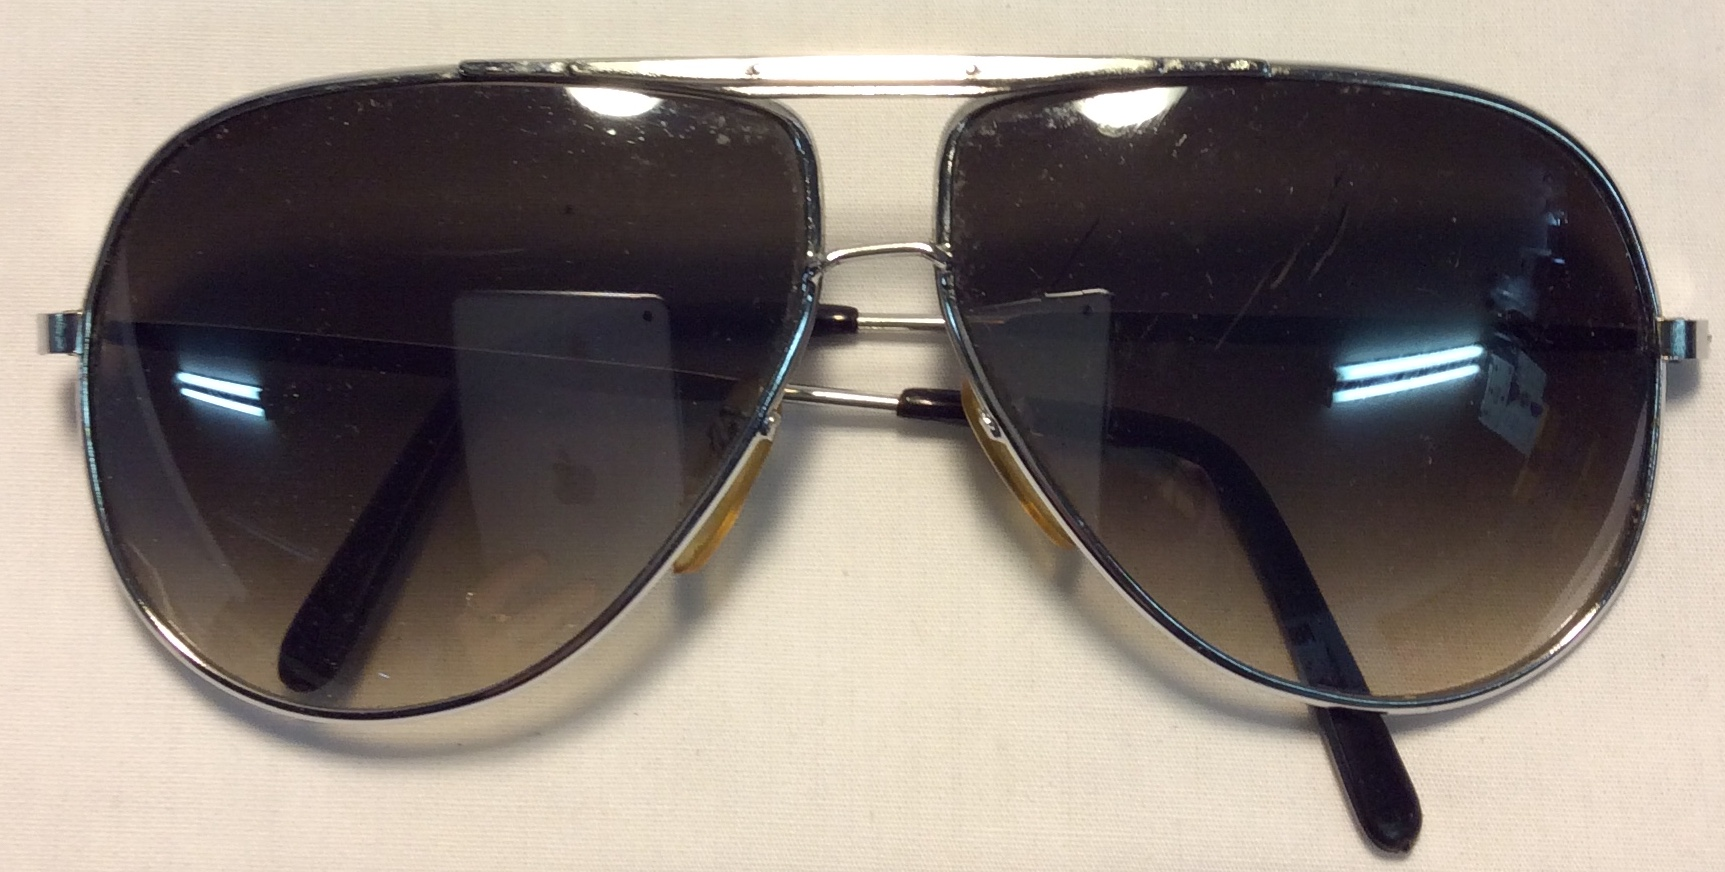 Silver plastic frames, black plastic